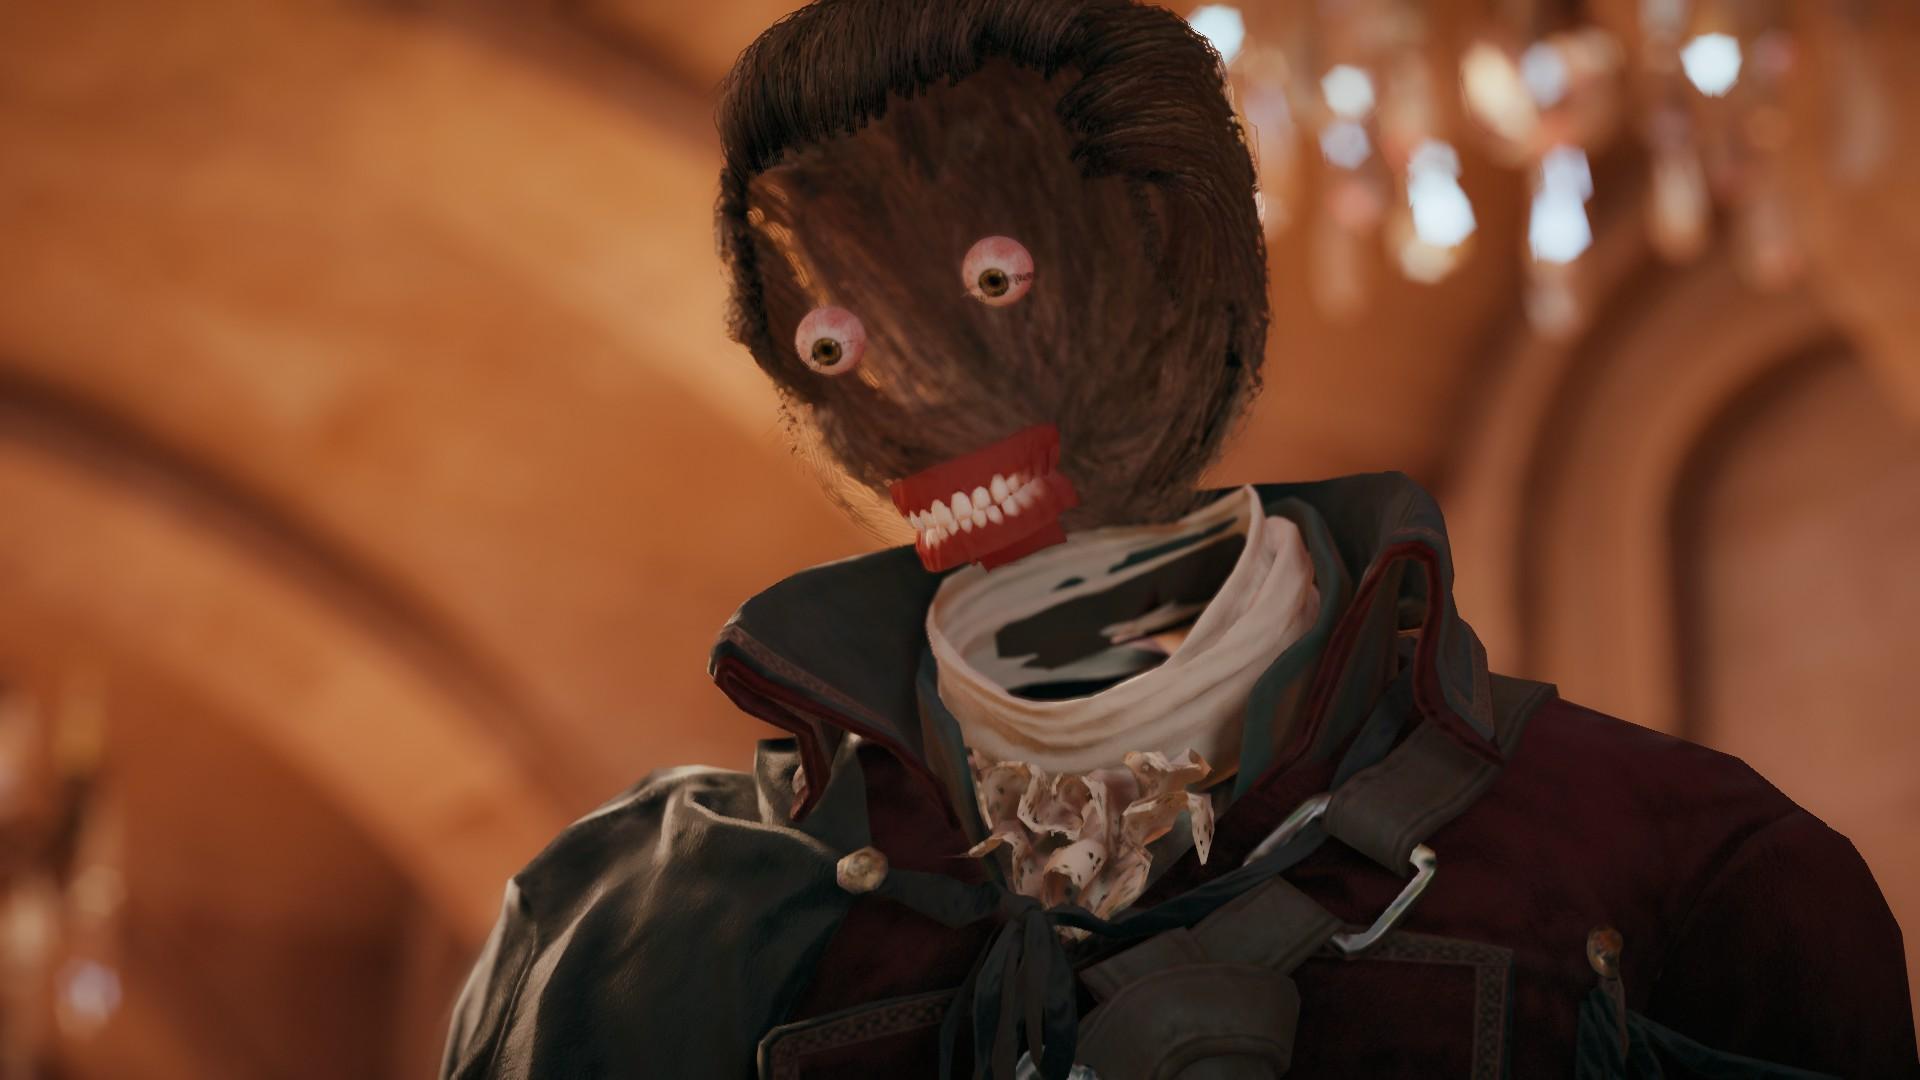 Assassin's Creed Face glitch